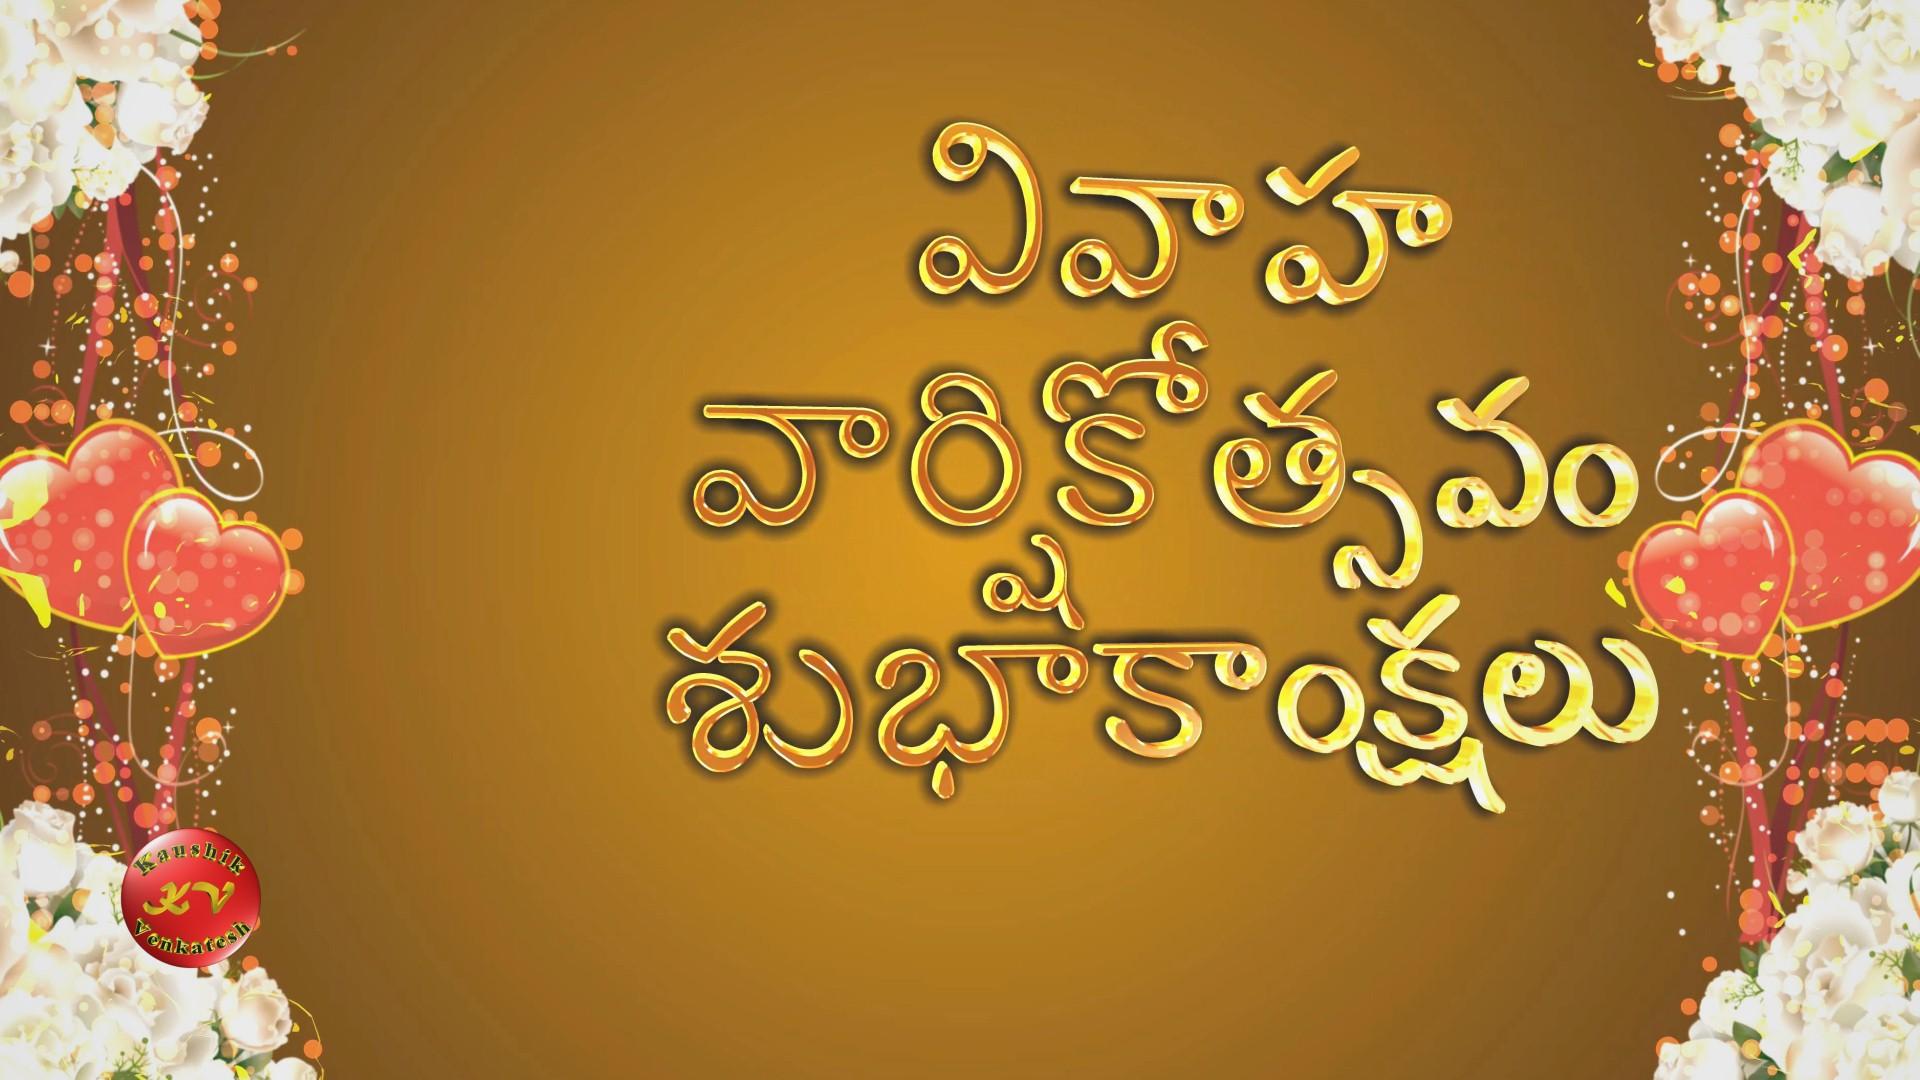 Greetings Image of Happy Wedding Anniversary Wishes in Telugu